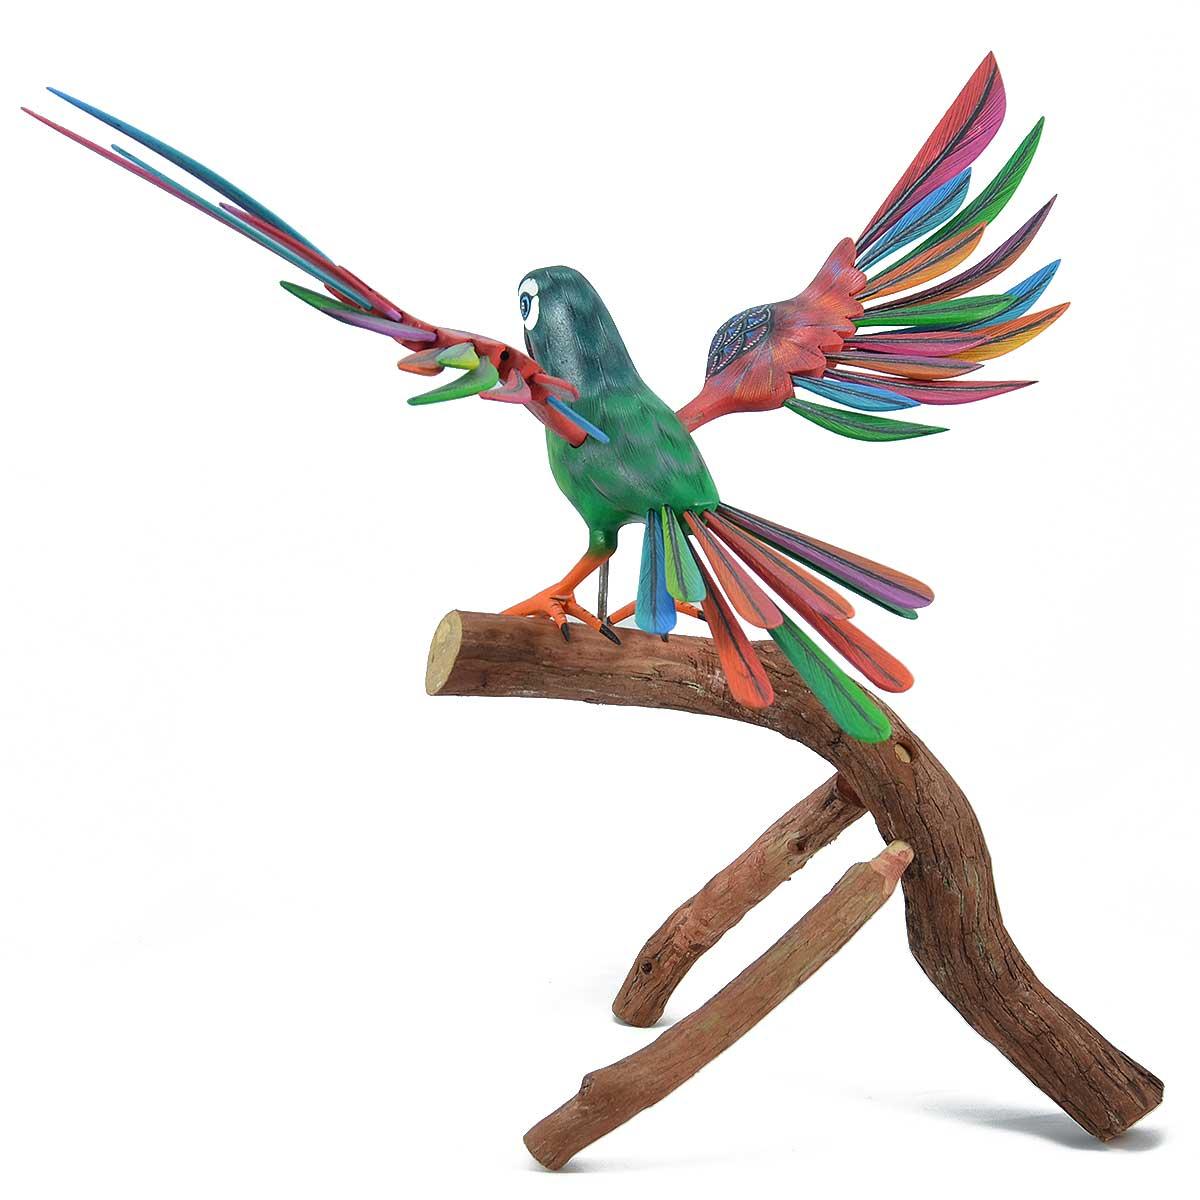 Agustín Cruz Tinoco Agustín Cruz Tinoco: Parrot Birds